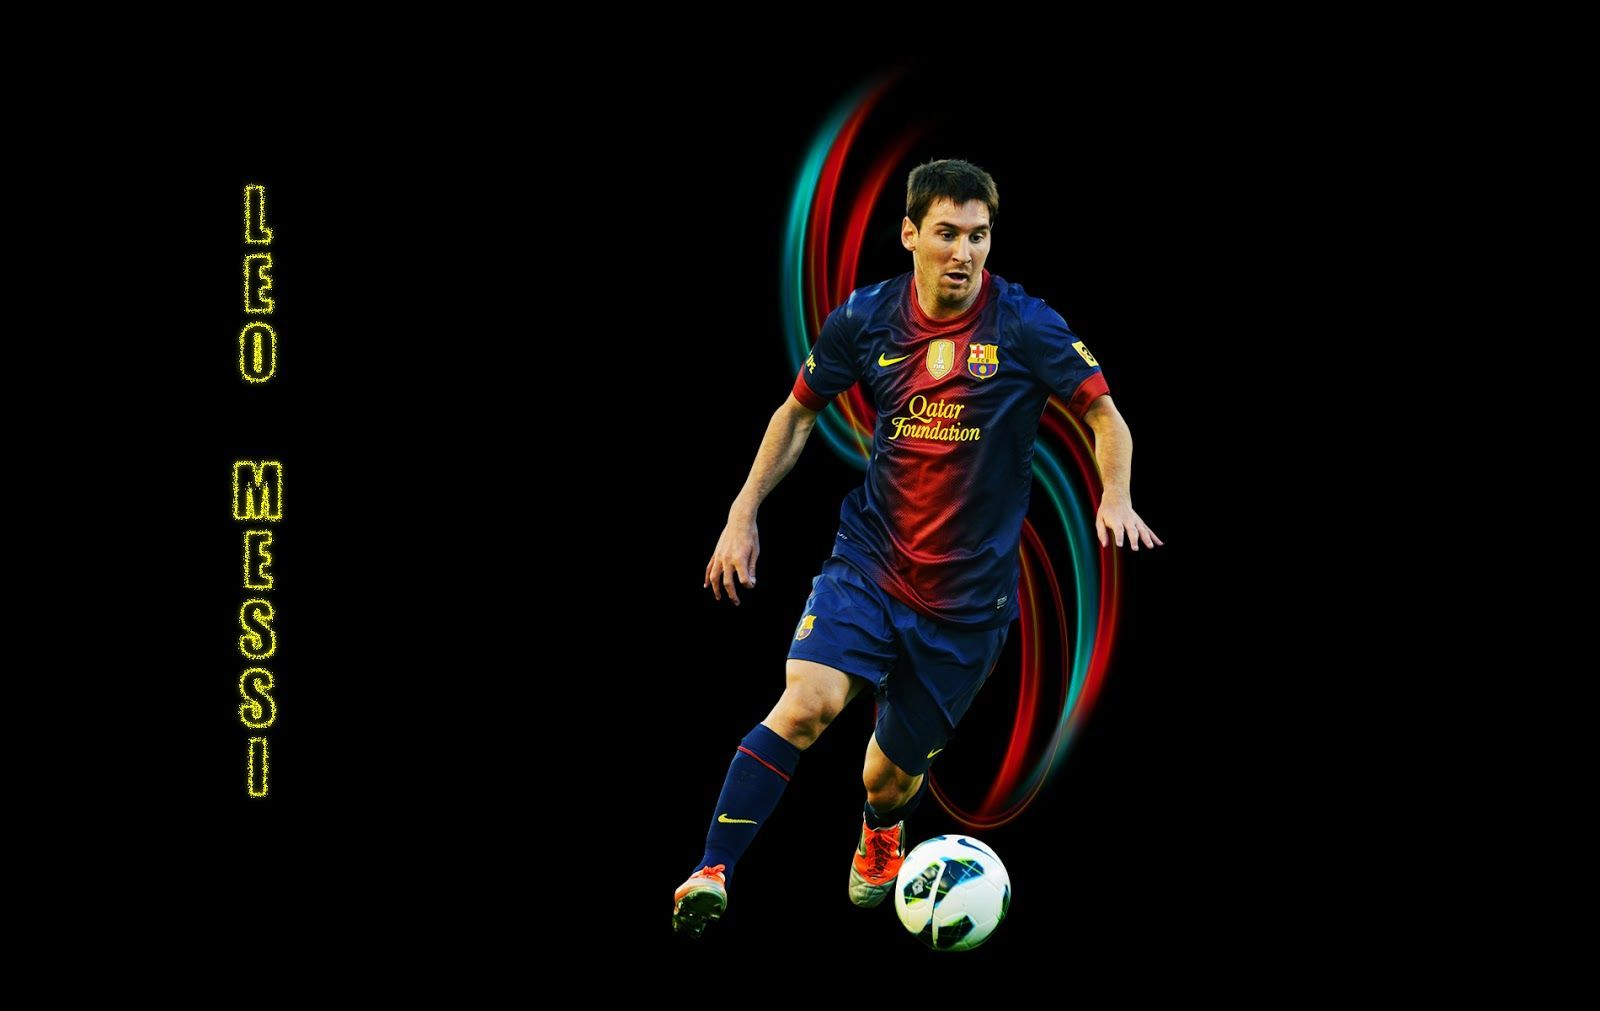 Messi Spanish Club Barcelona Wallpapers Hd Wallpapers 1024 640 Messi Hd Wallpaper 64 Wallpapers Adorable Wallpa Lionel Messi Wallpapers Lionel Messi Messi